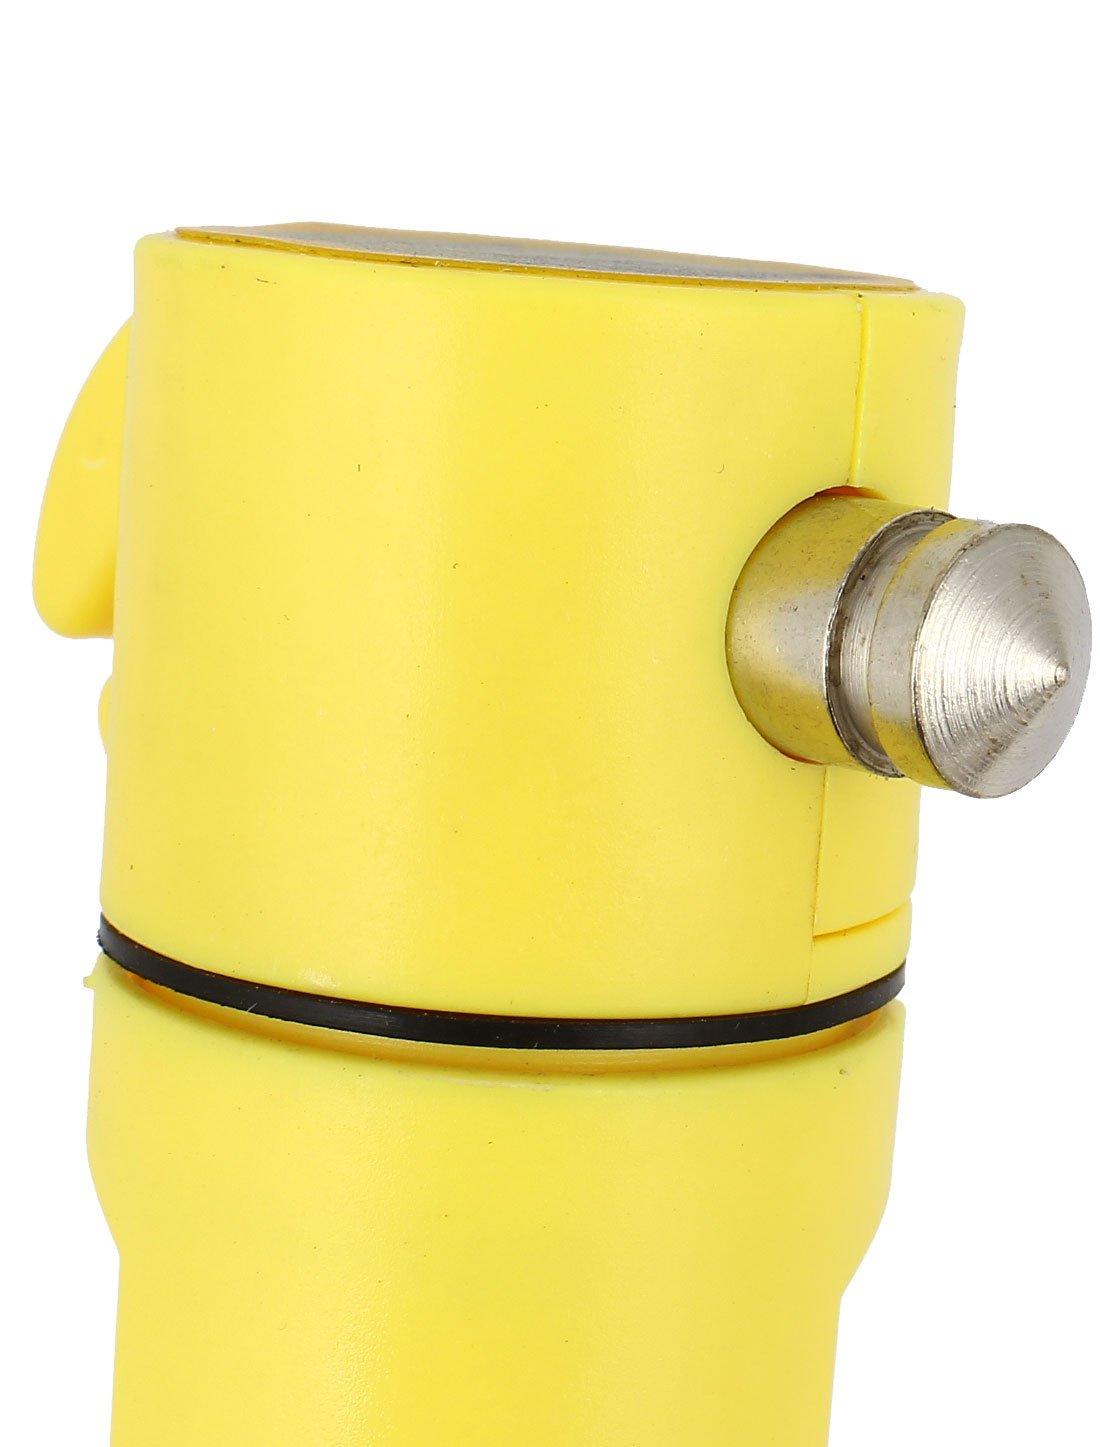 uxcell LED Flashlight Window Break Hammer Belt Cutter by uxcell (Image #3)